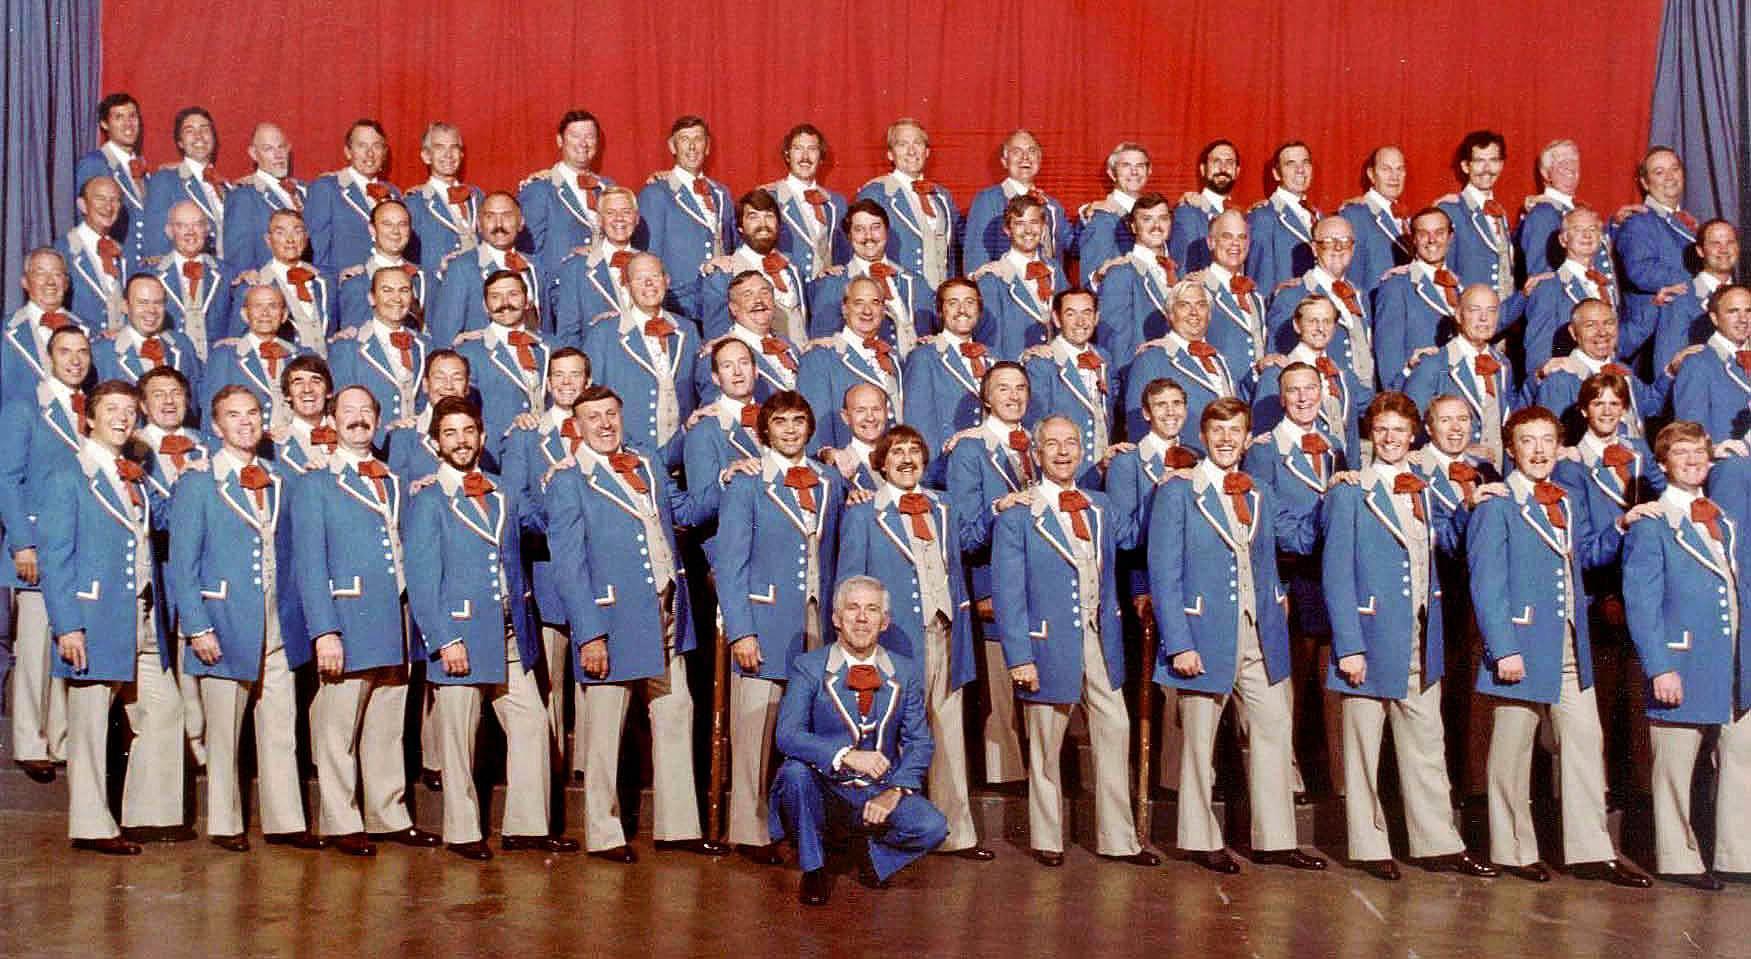 The Tobaccoland Chorus (previous name of the Virginians)